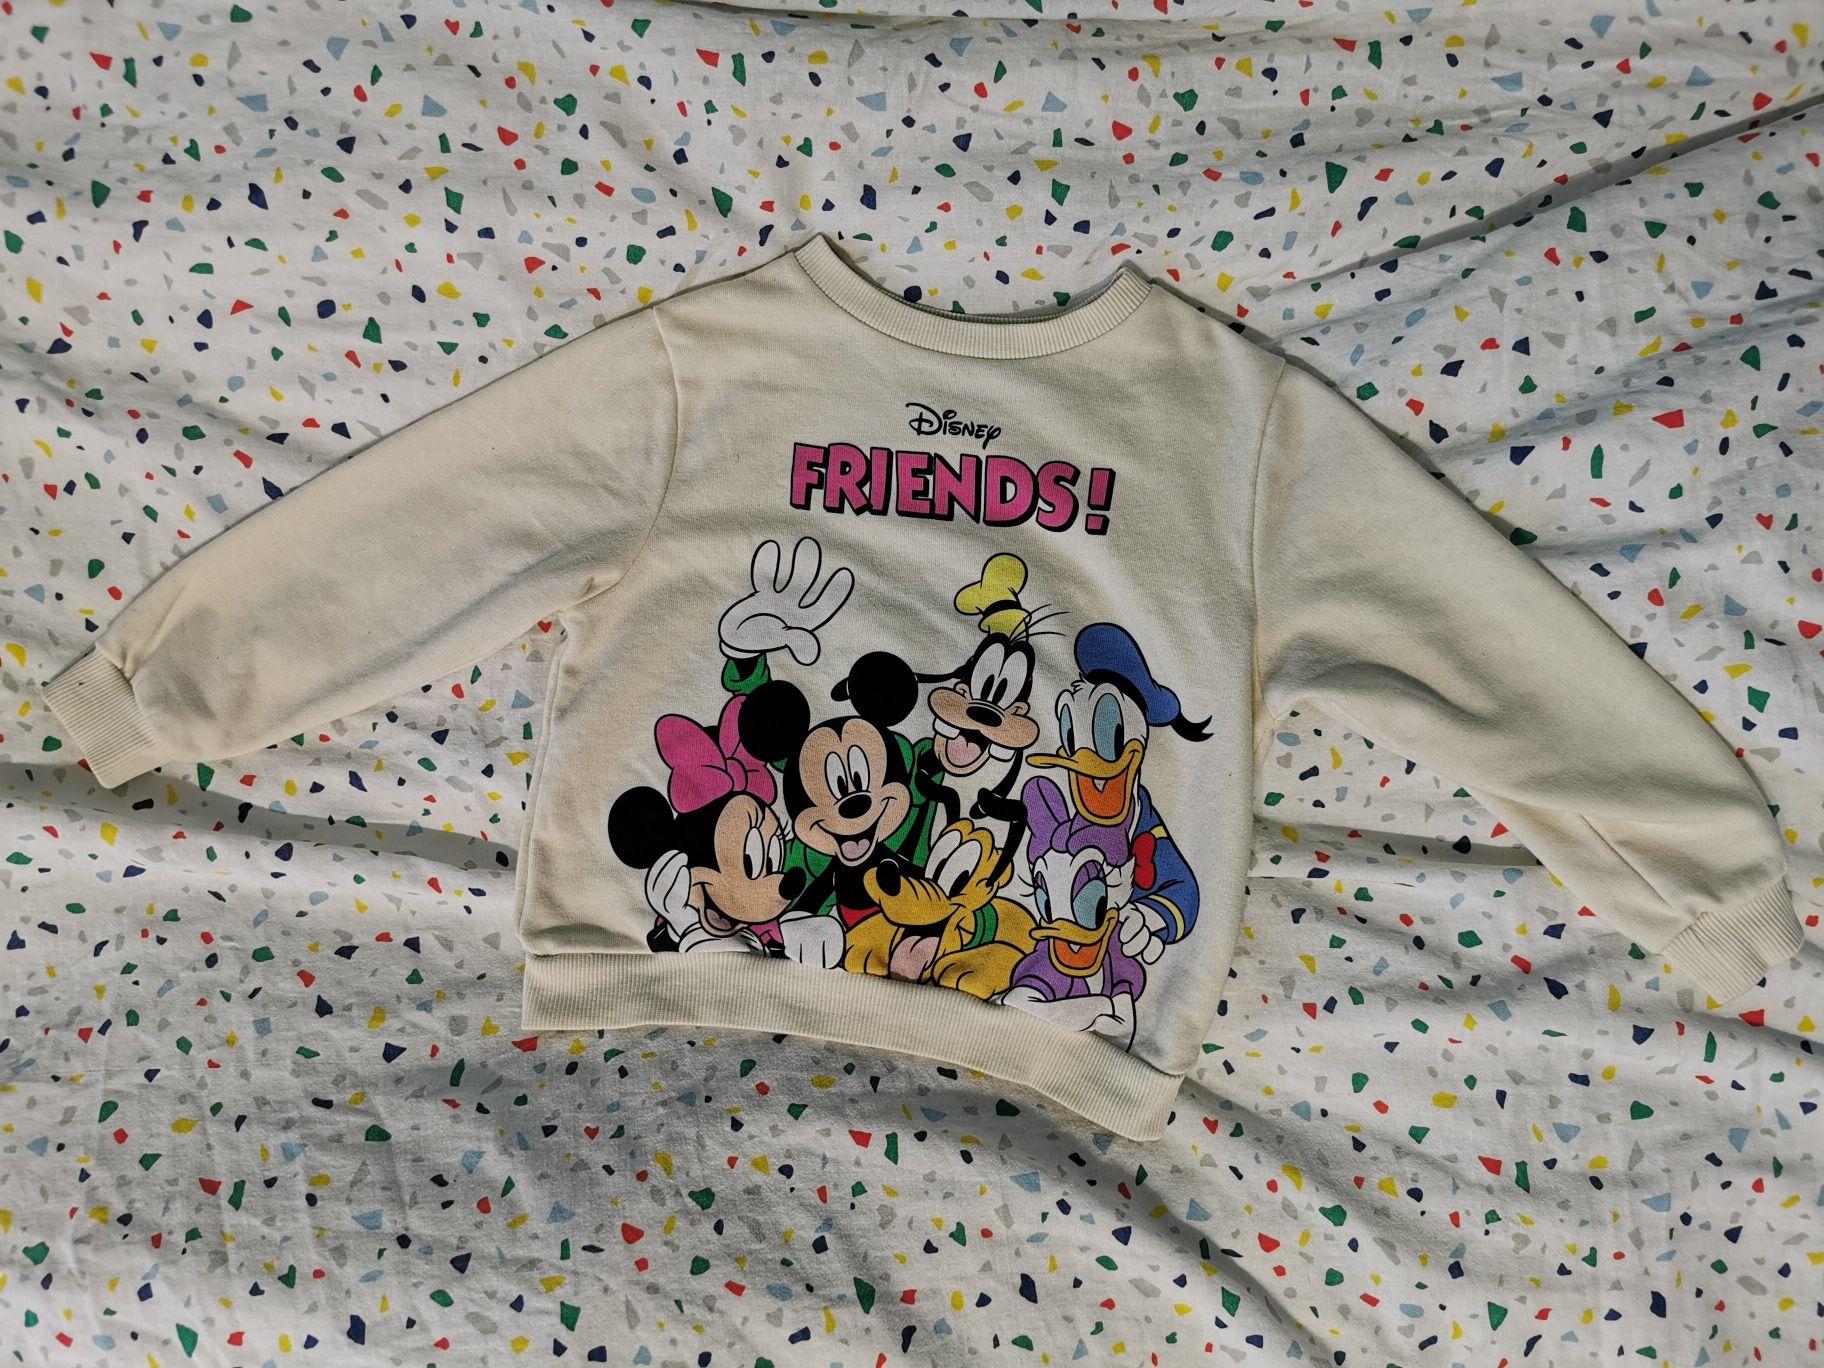 H&M bluza Disney Myszka Miki